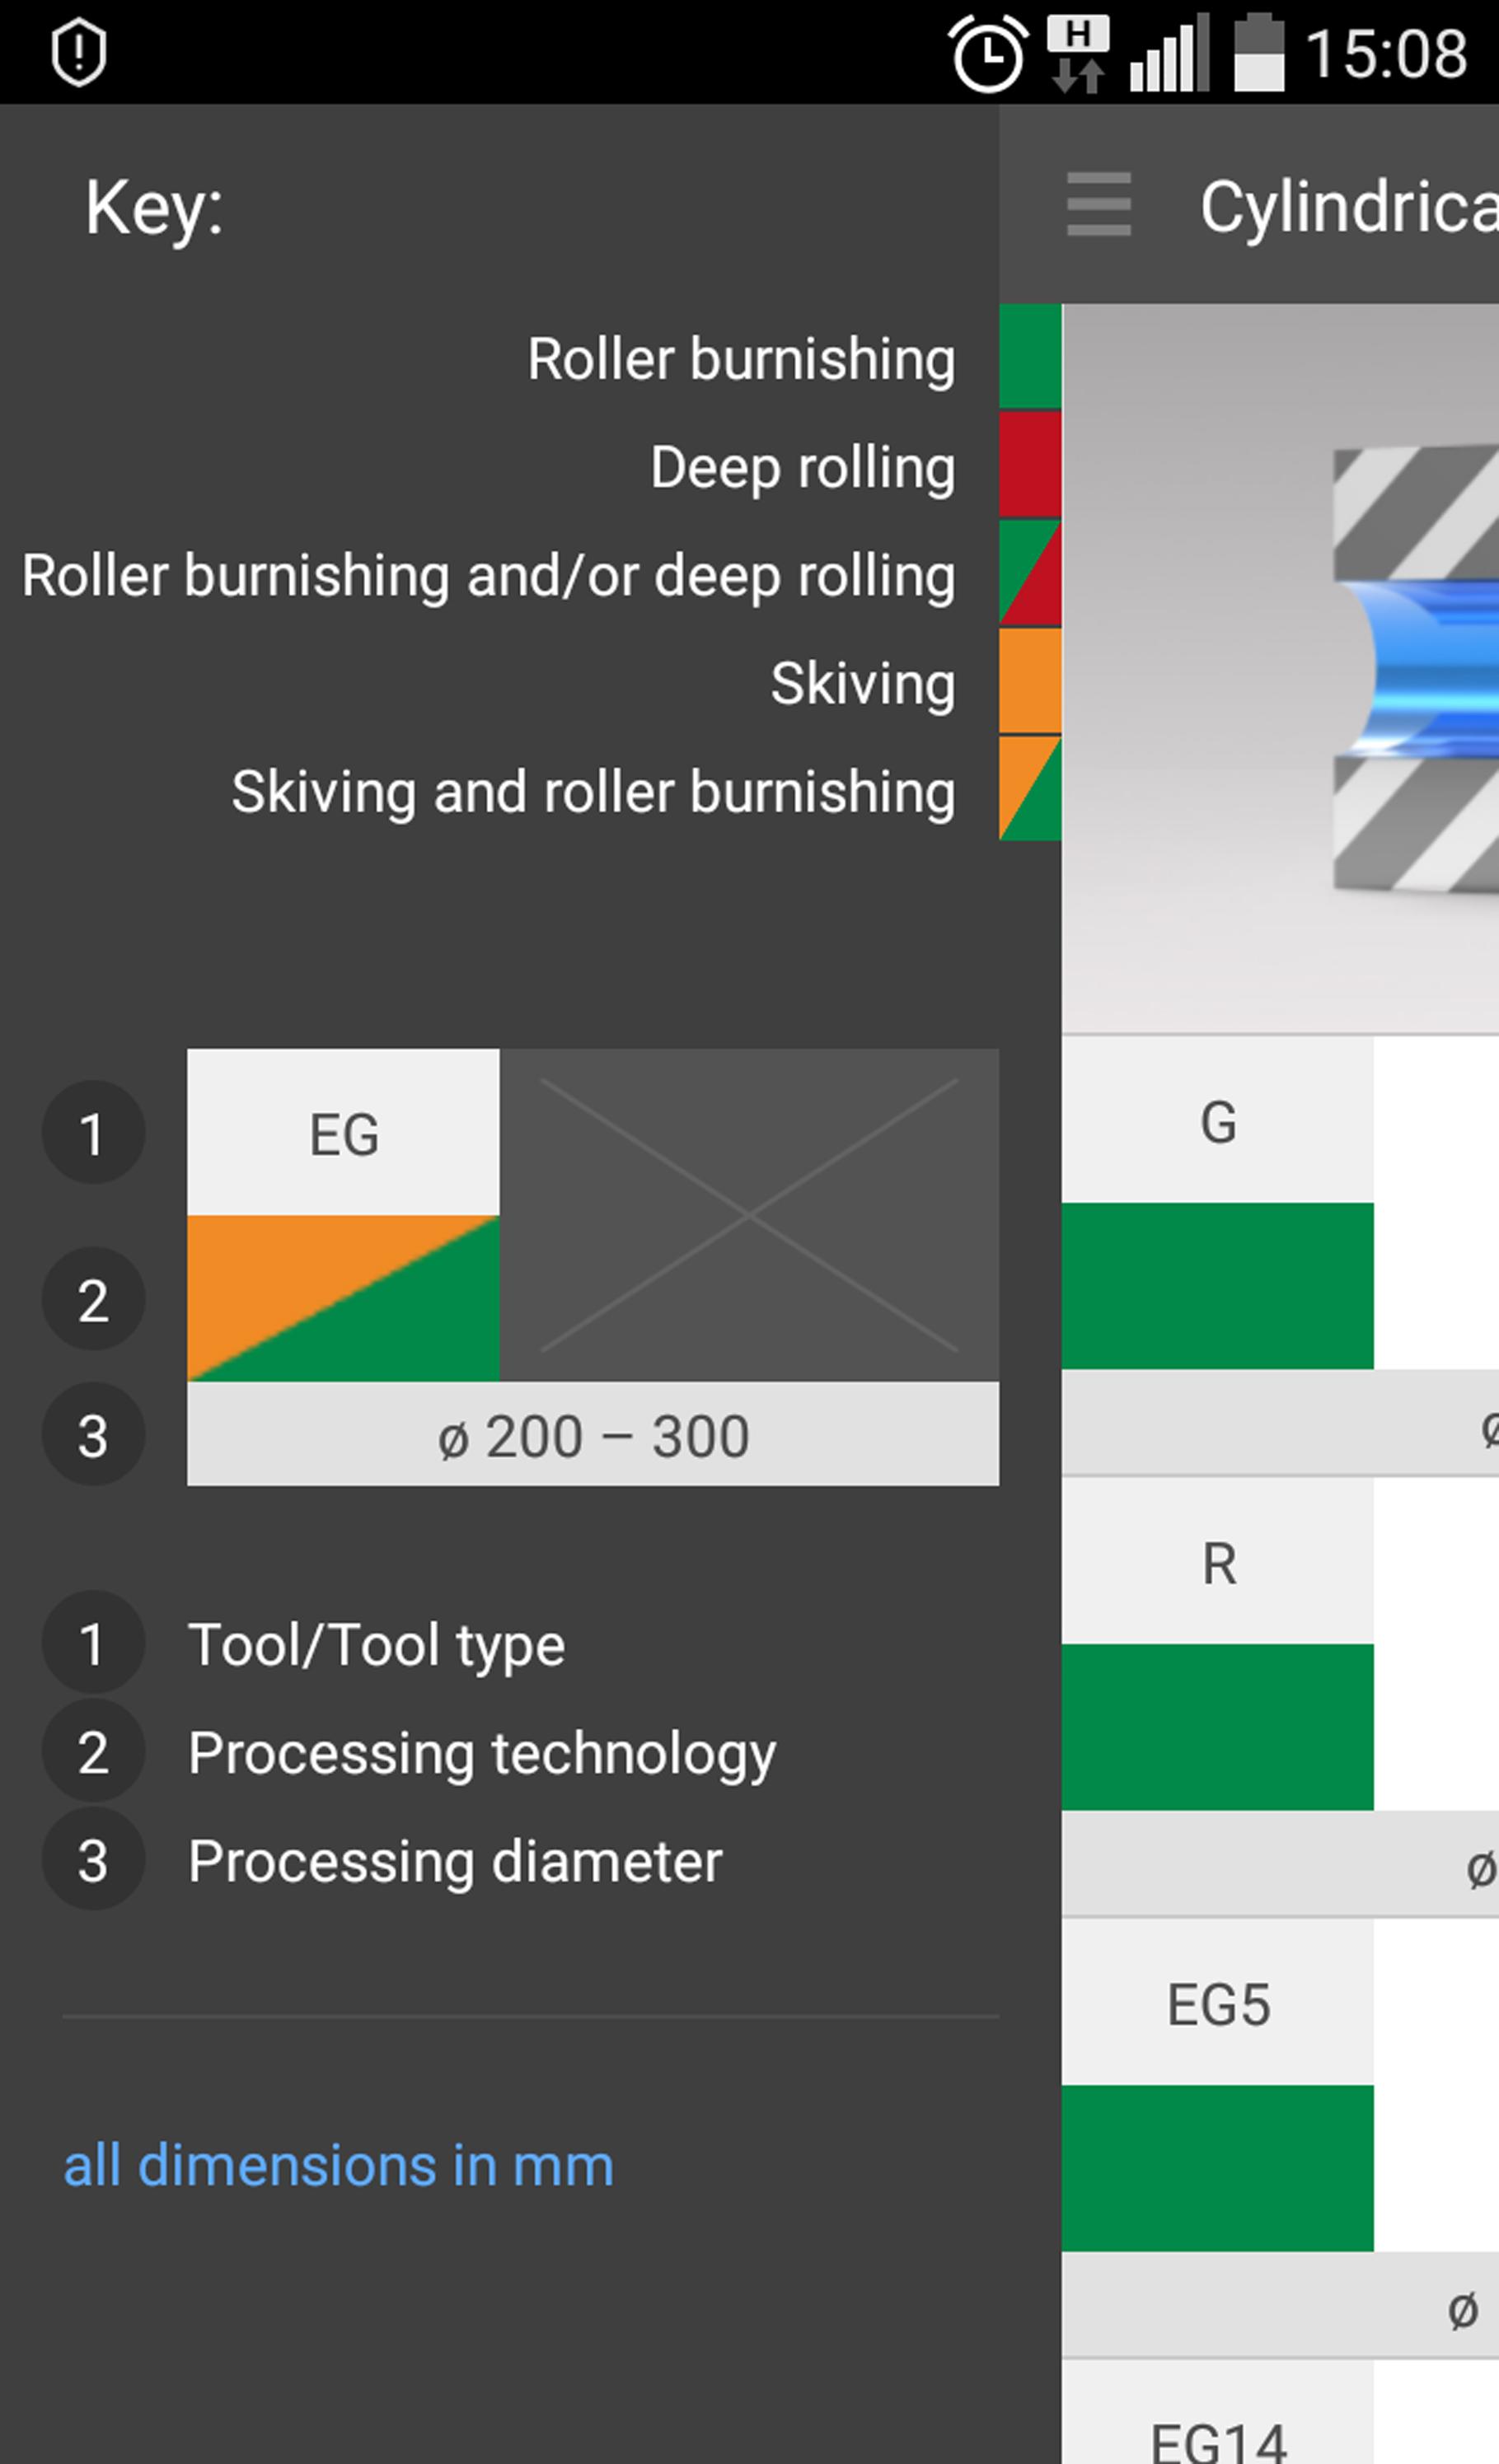 ECOROLL MechKon App - Product configurator and calculator